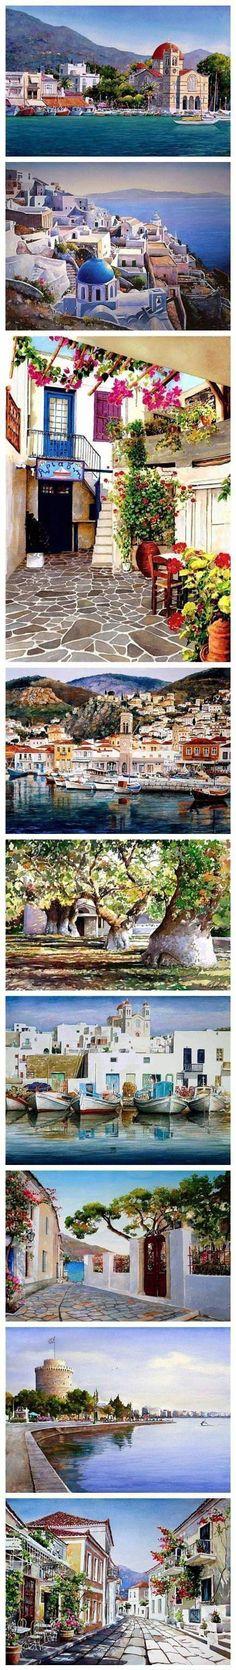 Watercolor By Pantelis Zografos